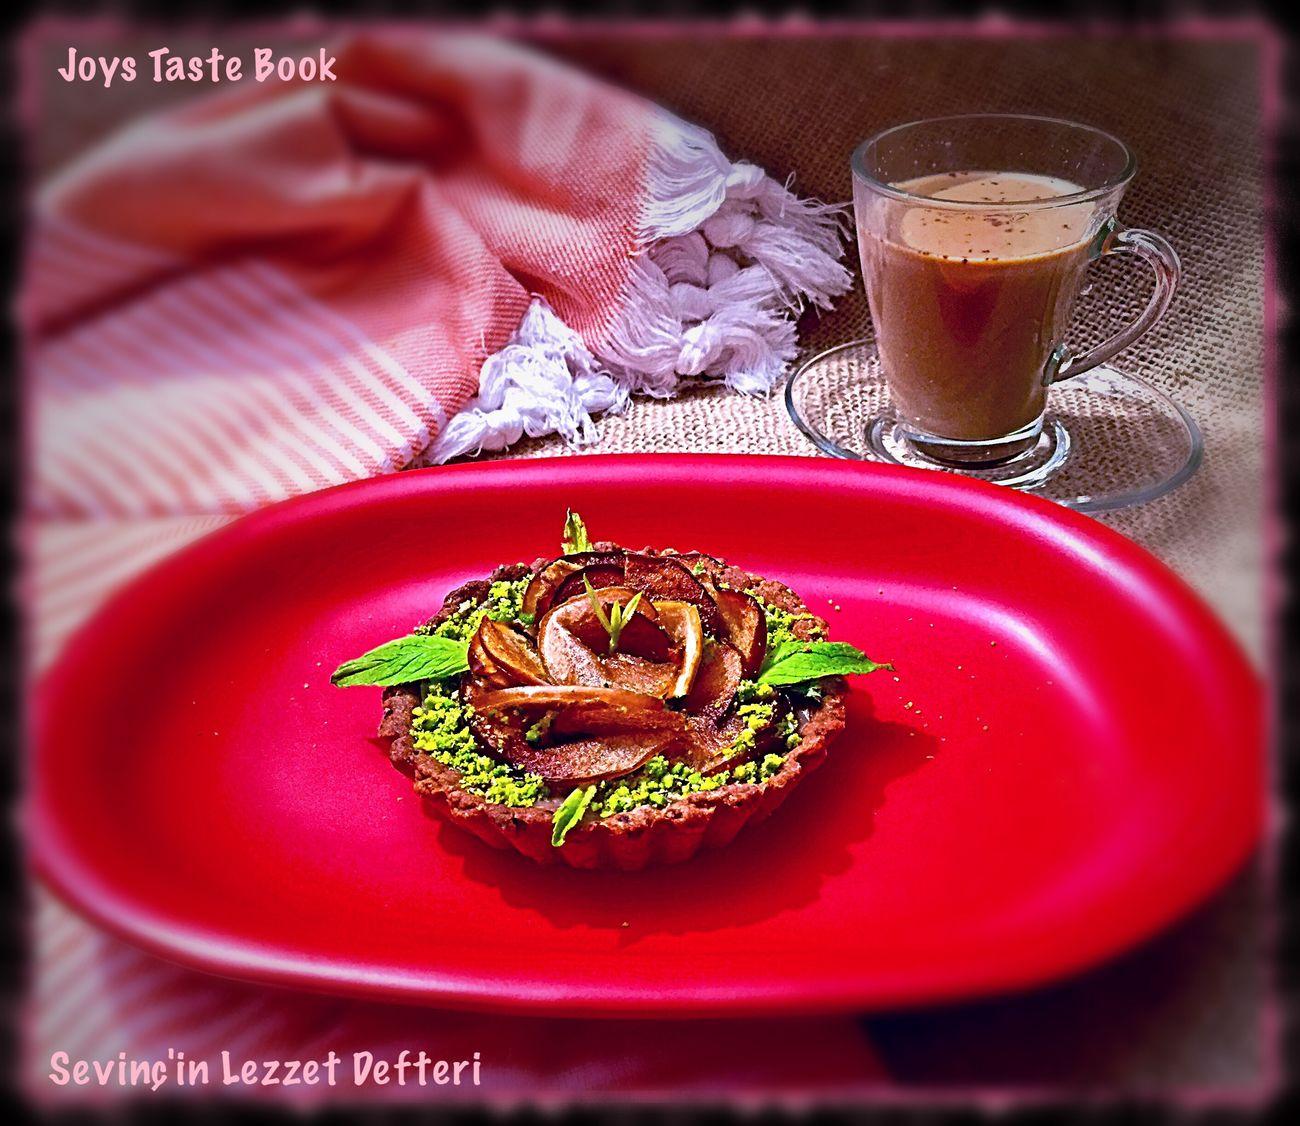 Kahvenin yanına güllü tart 😋👌🏿 Food Food And Drink Sweet Food Drink Lezzet Küpü Istanbul Turkey JoysTasteBook Sevinç'in Lezzet Defteri Foodphotography Coffee Time Tart Healthy Eating Yummy Like SevinçYiğitArabacı Delicious Foodblog Foodblogger Kinoa Amaranth Chia Sweet Pie EyeEm Pie